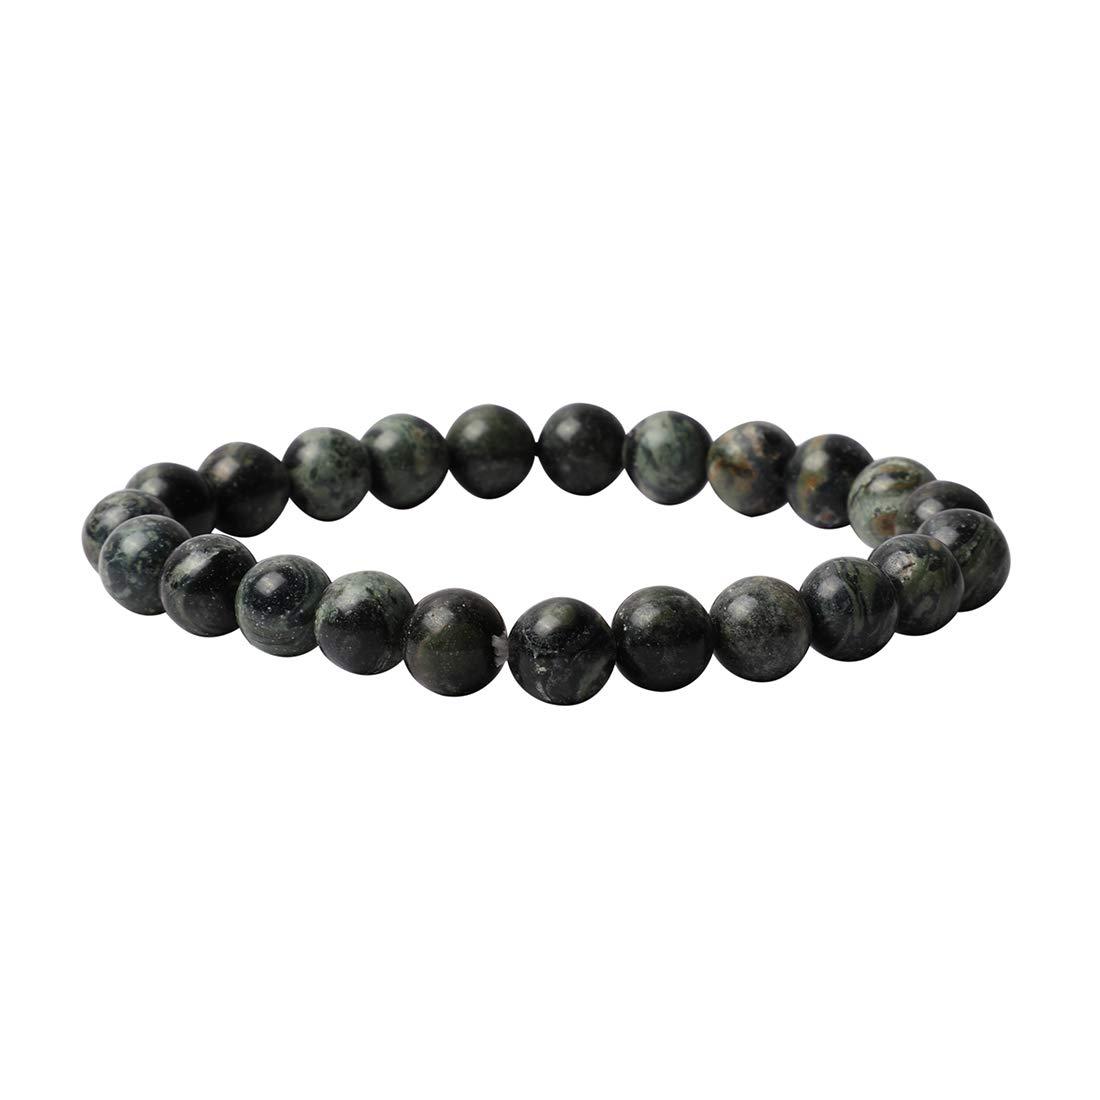 Allettare Seraphinite Spiritual Enlightenment Bracelet